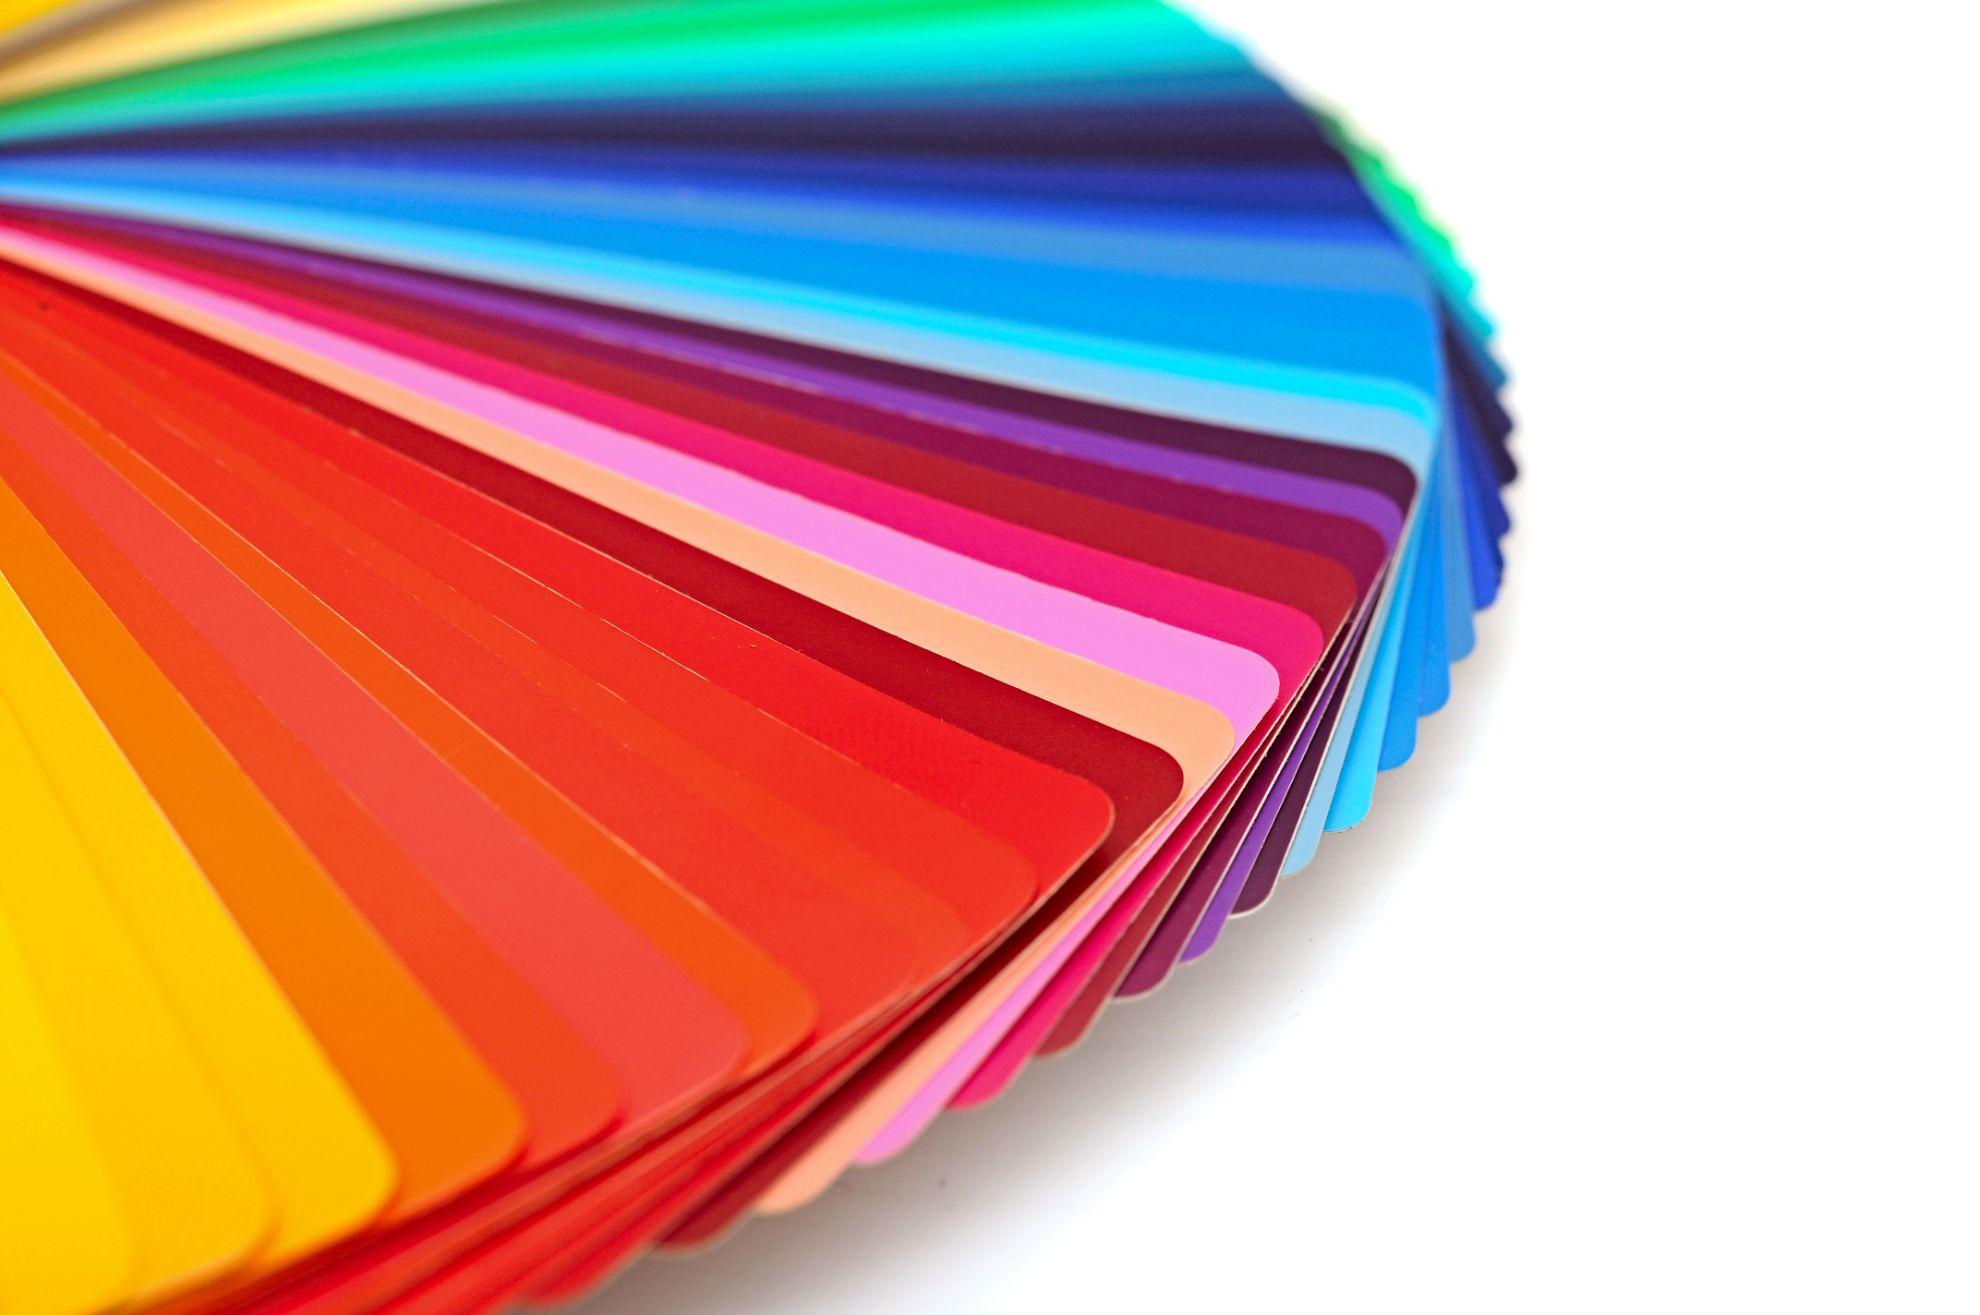 Bespoke Coloured Painted Radiators